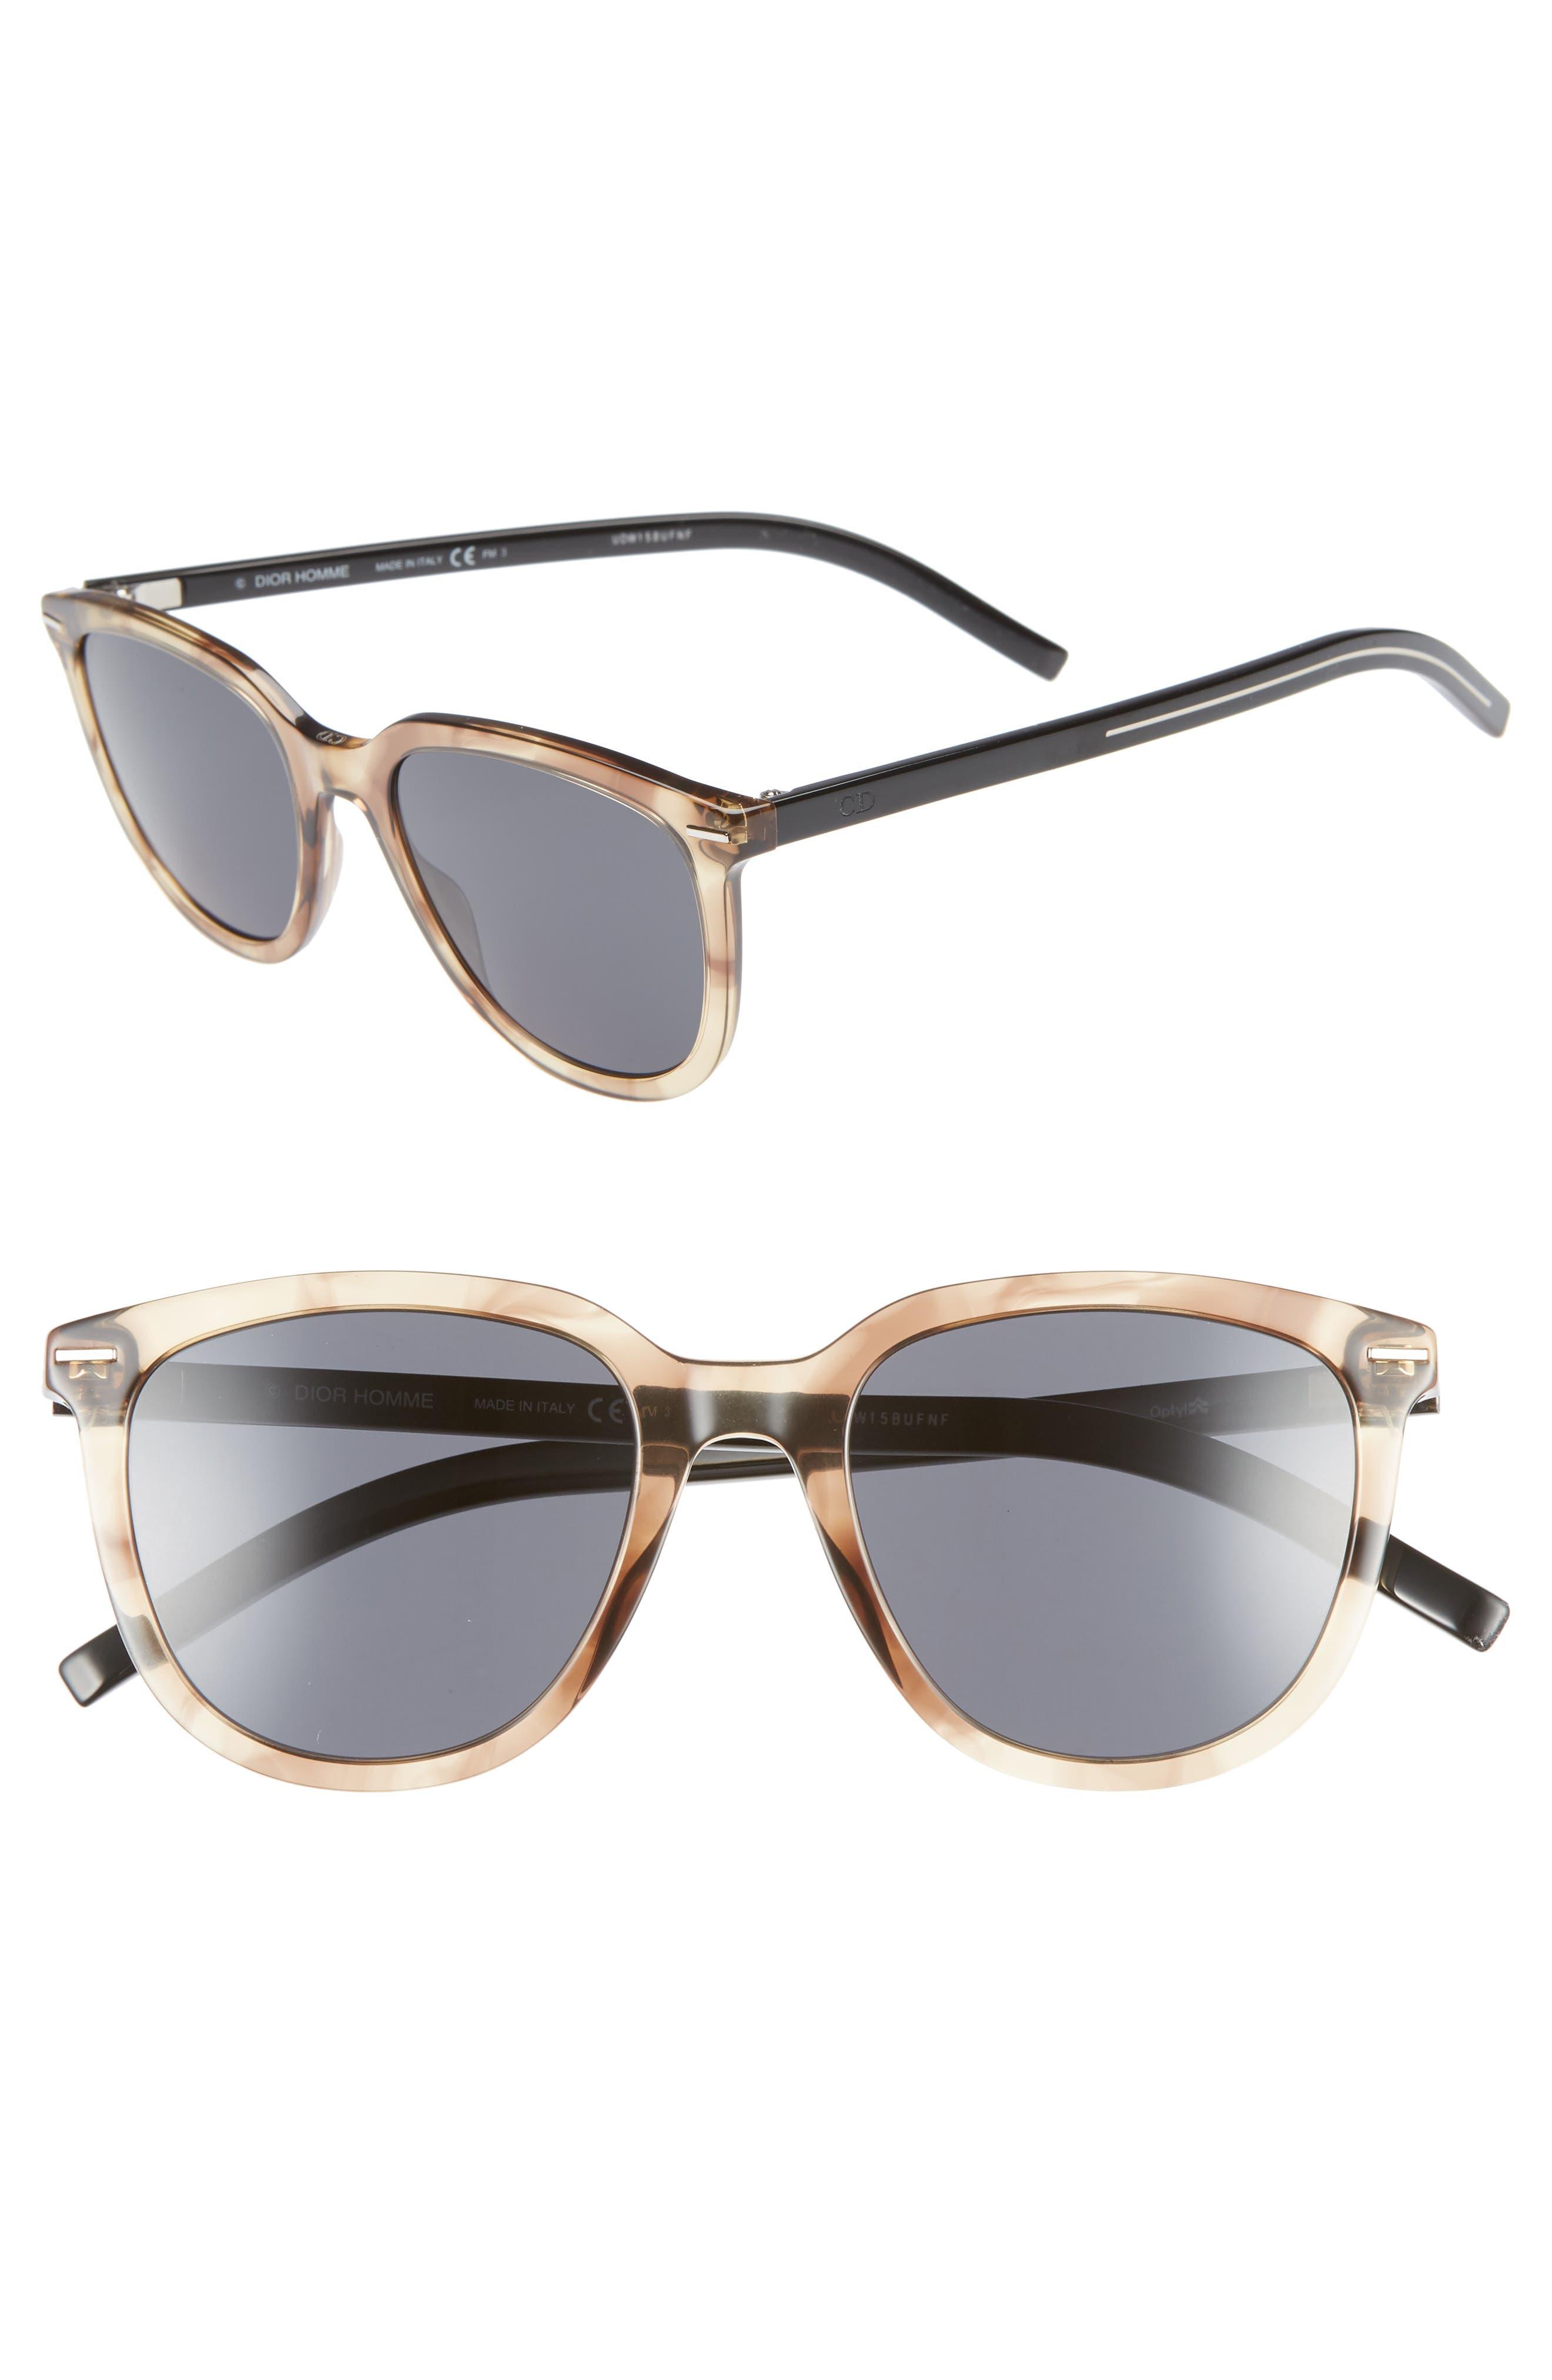 ca4f6766cd Dior 51Mm Polarized Sunglasses - Brown Havana